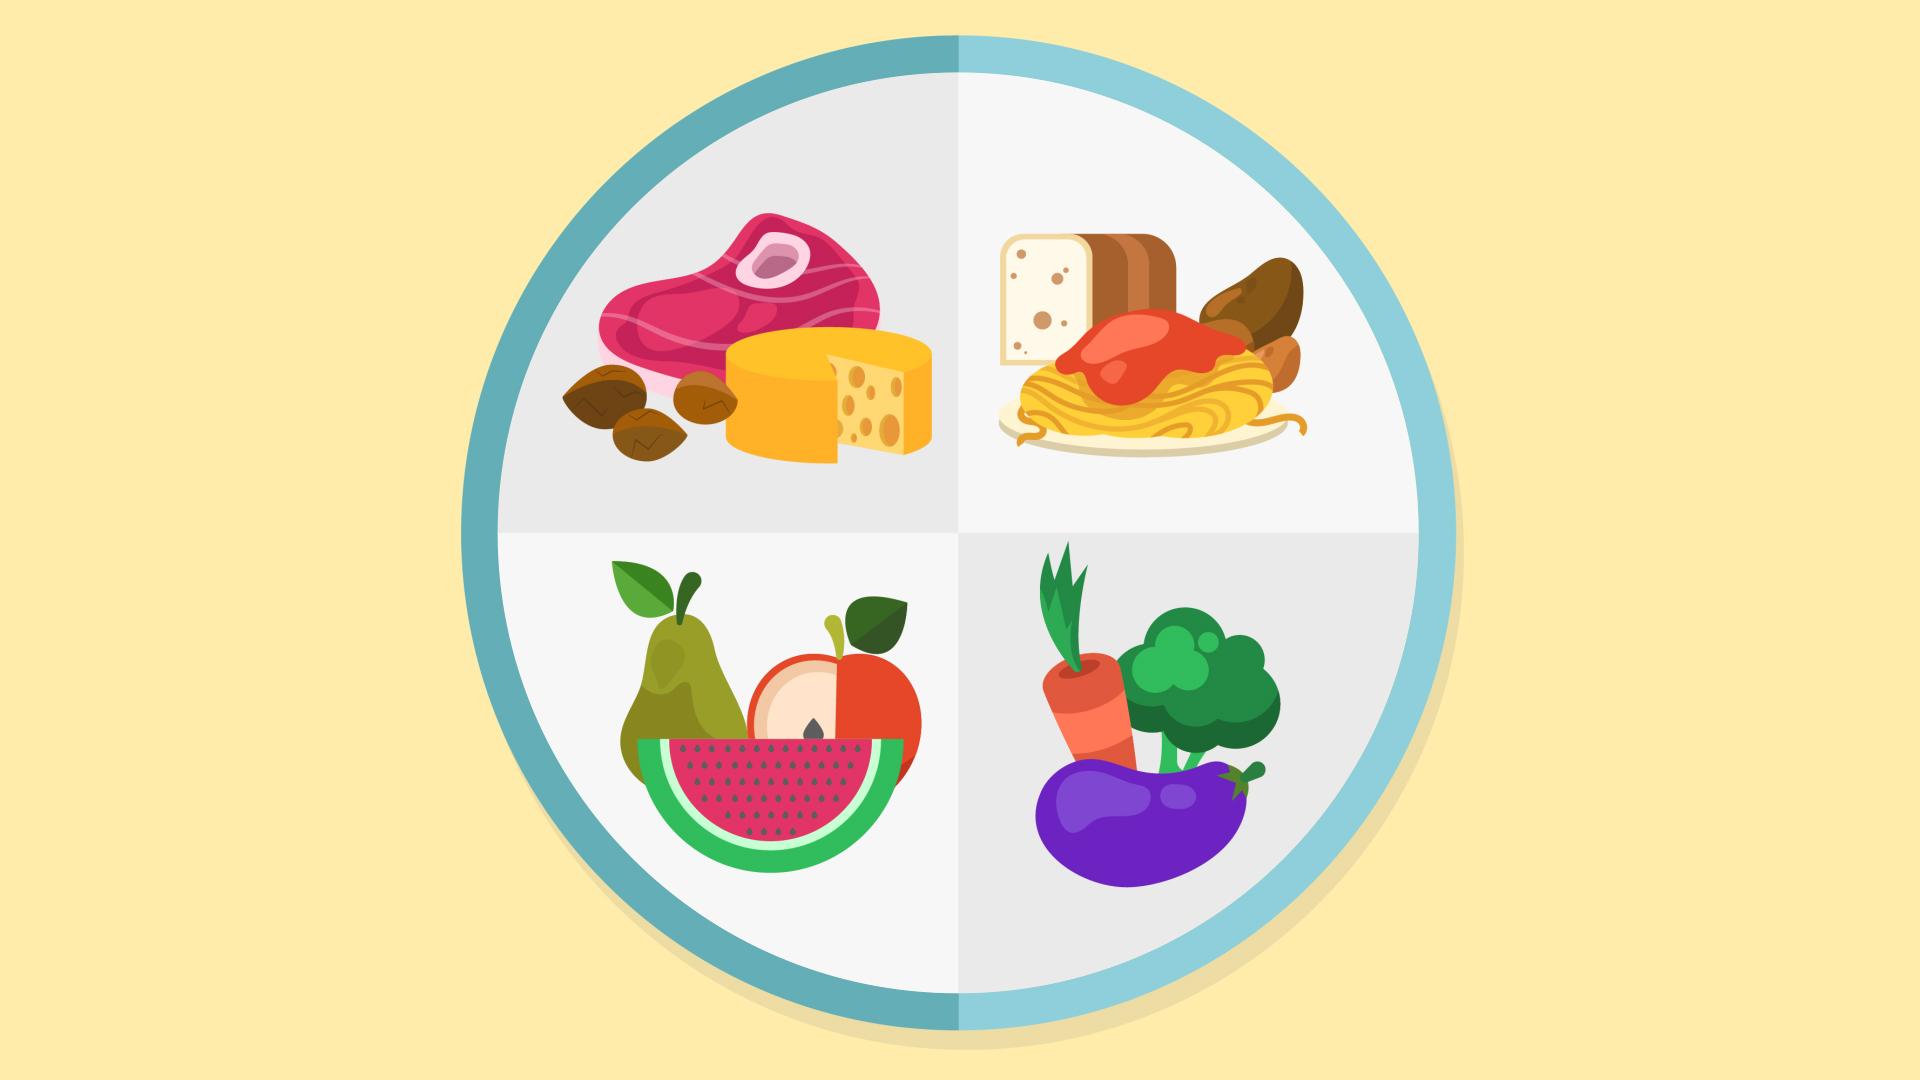 Principles of a balanced diet